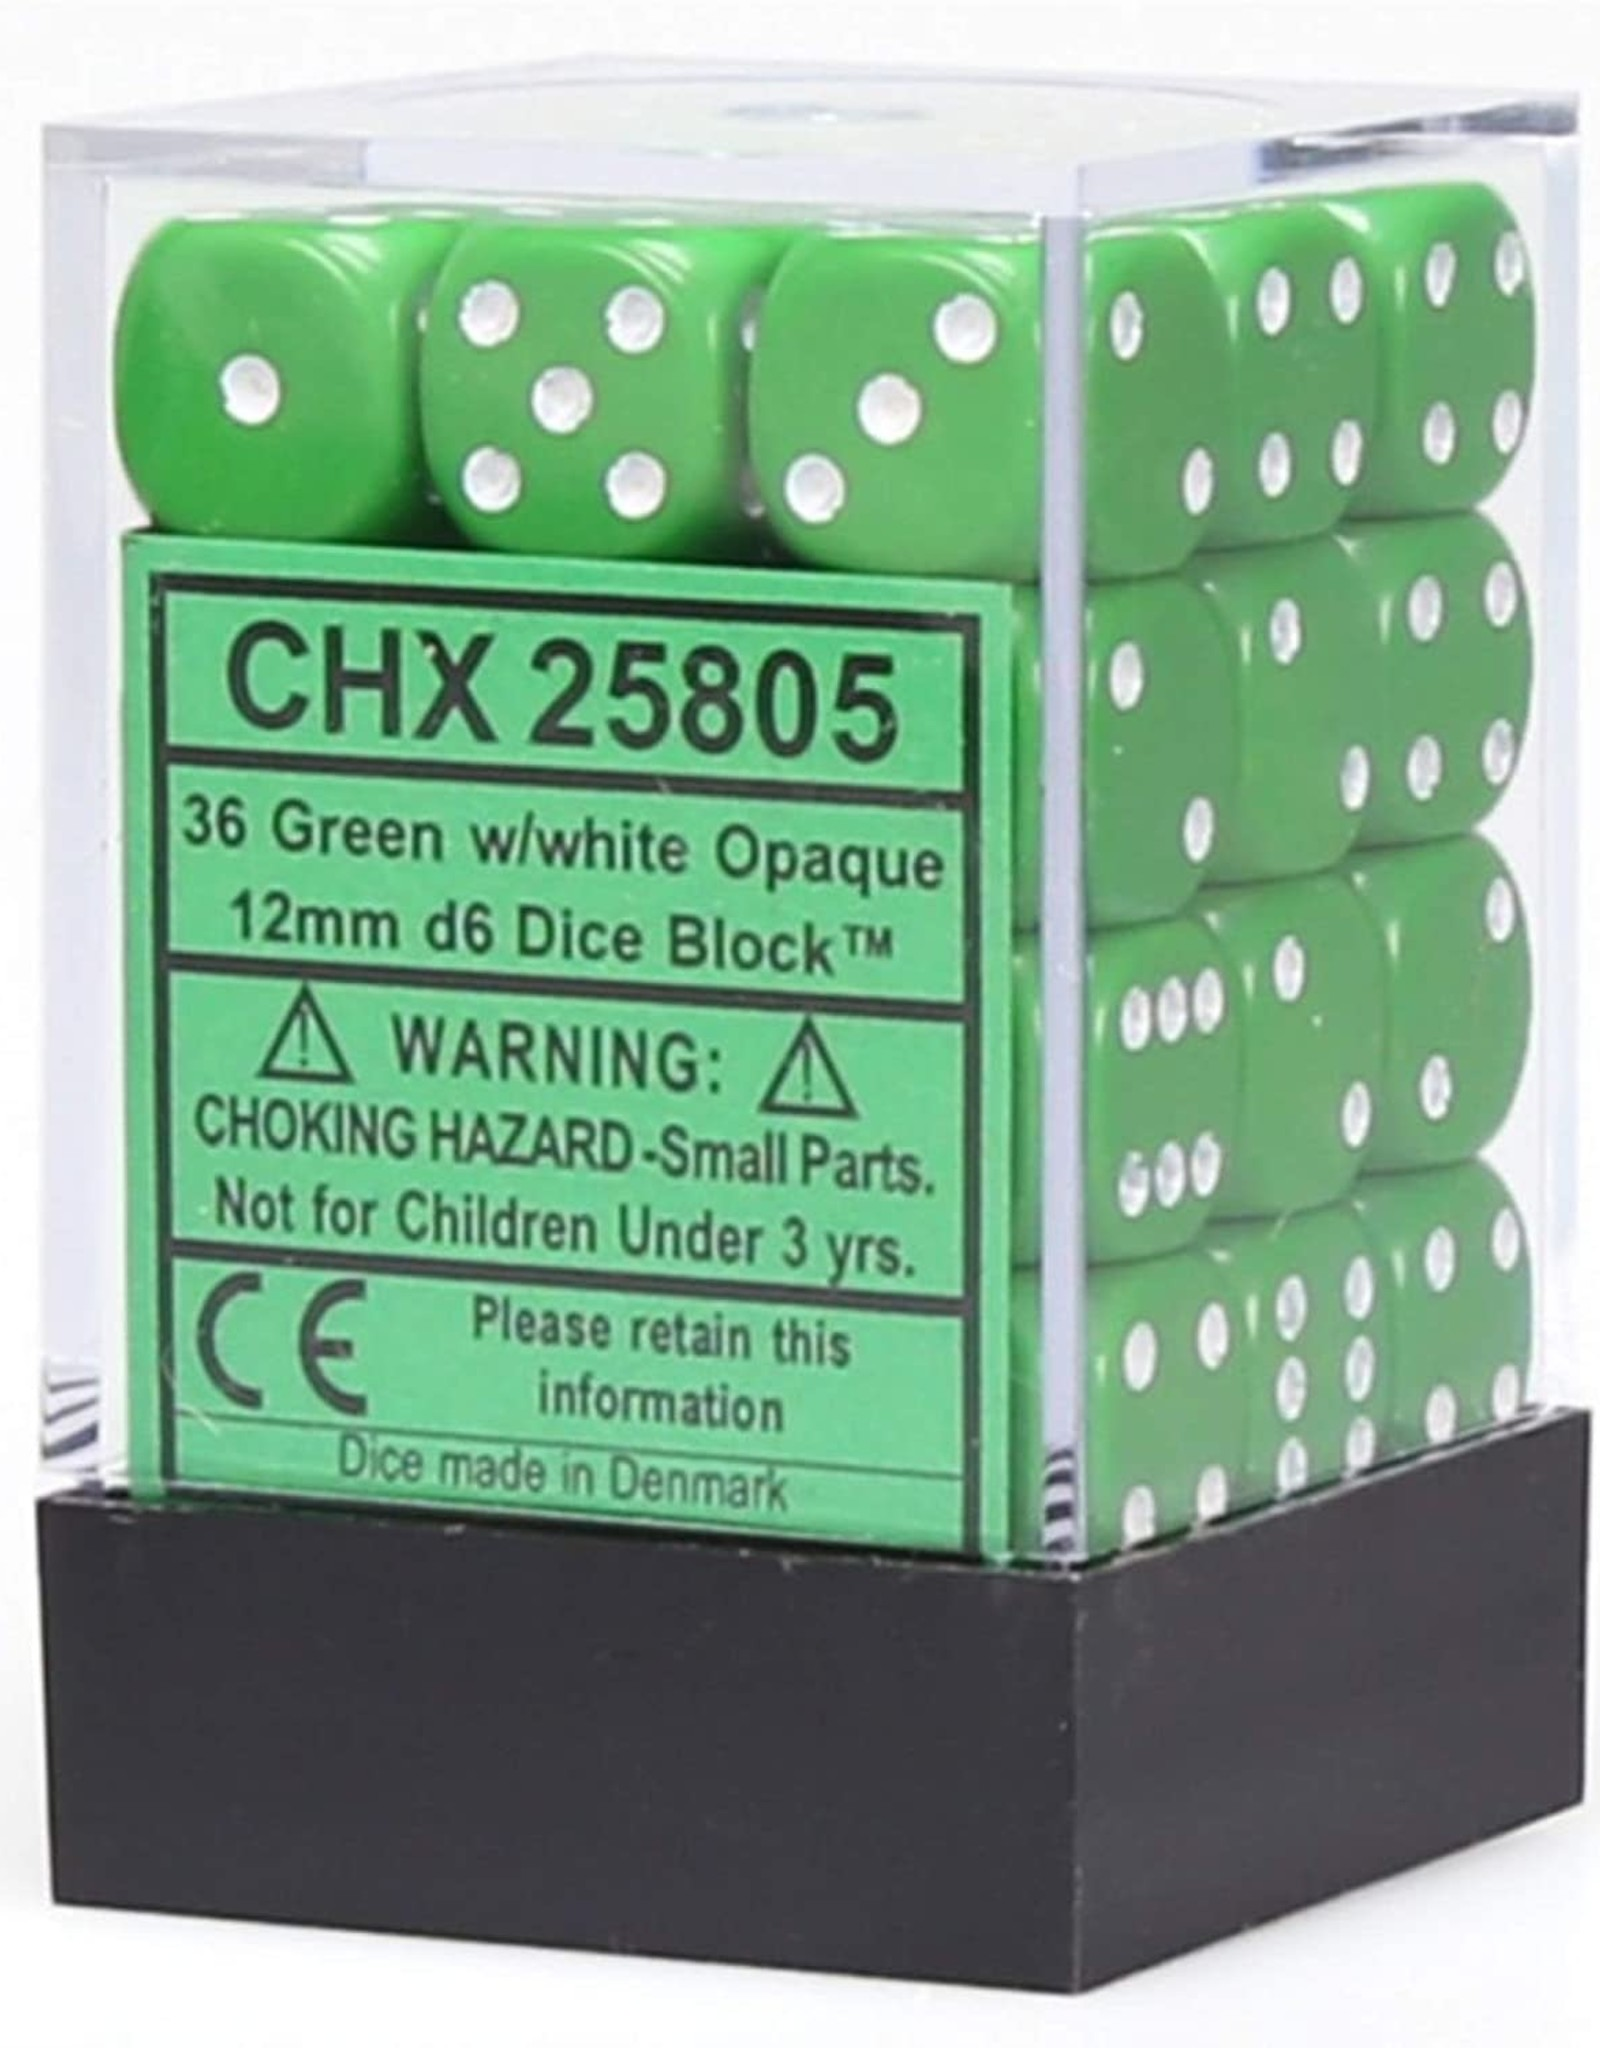 CHX 25805 Opaque: 36D6 Green/White